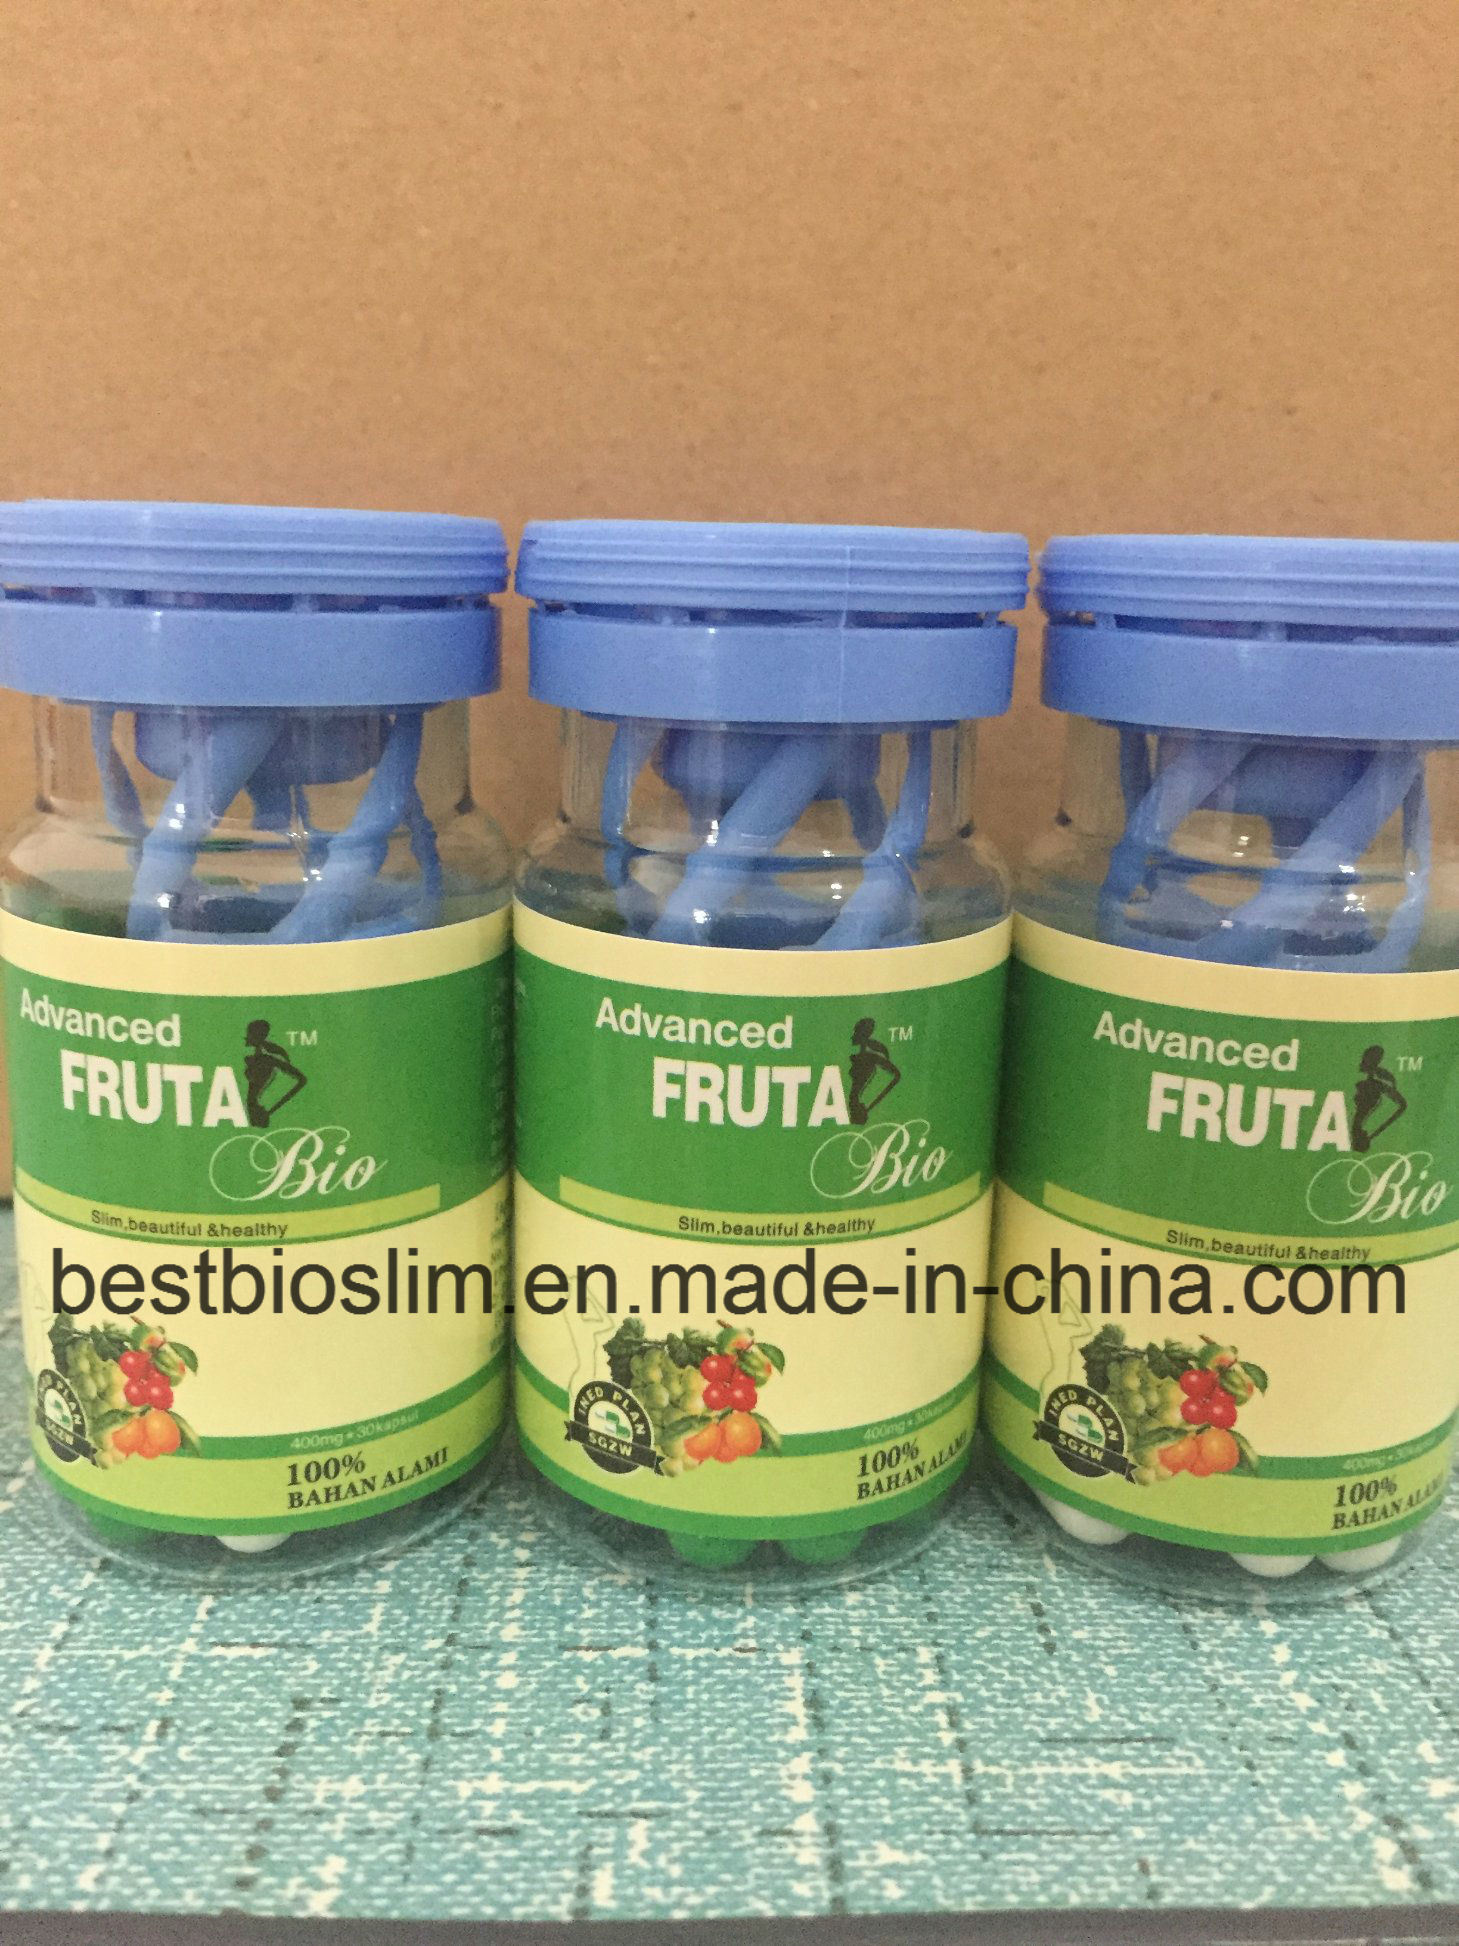 Frutabio Weight Loss Pills Fat Burner Strong Slimming Capsules